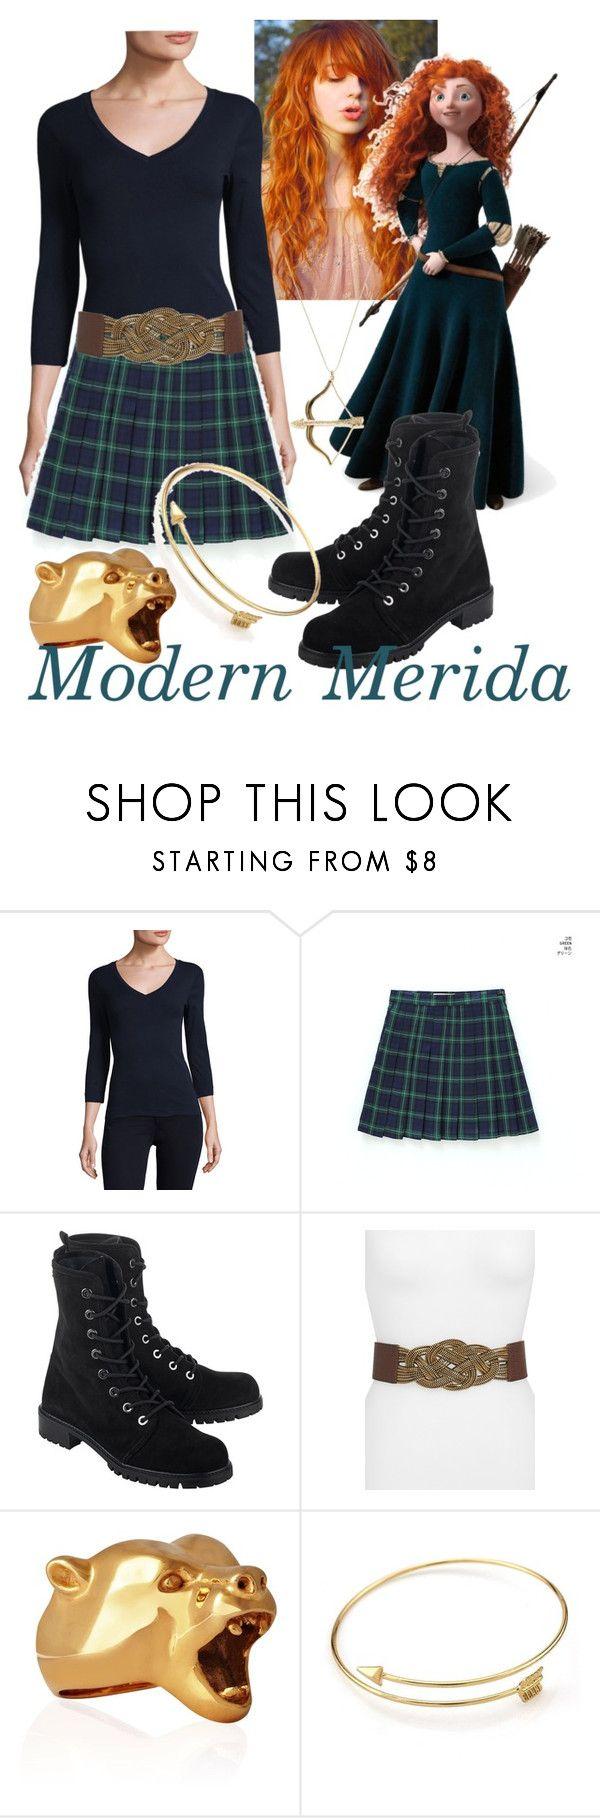 """Modern Merida"" by neverland-dancer ❤ liked on Polyvore featuring Three Dots, Merida, chuu, Stuart Weitzman, Steven by Steve Madden, StrangeFruit, Sydney Evan and modern"